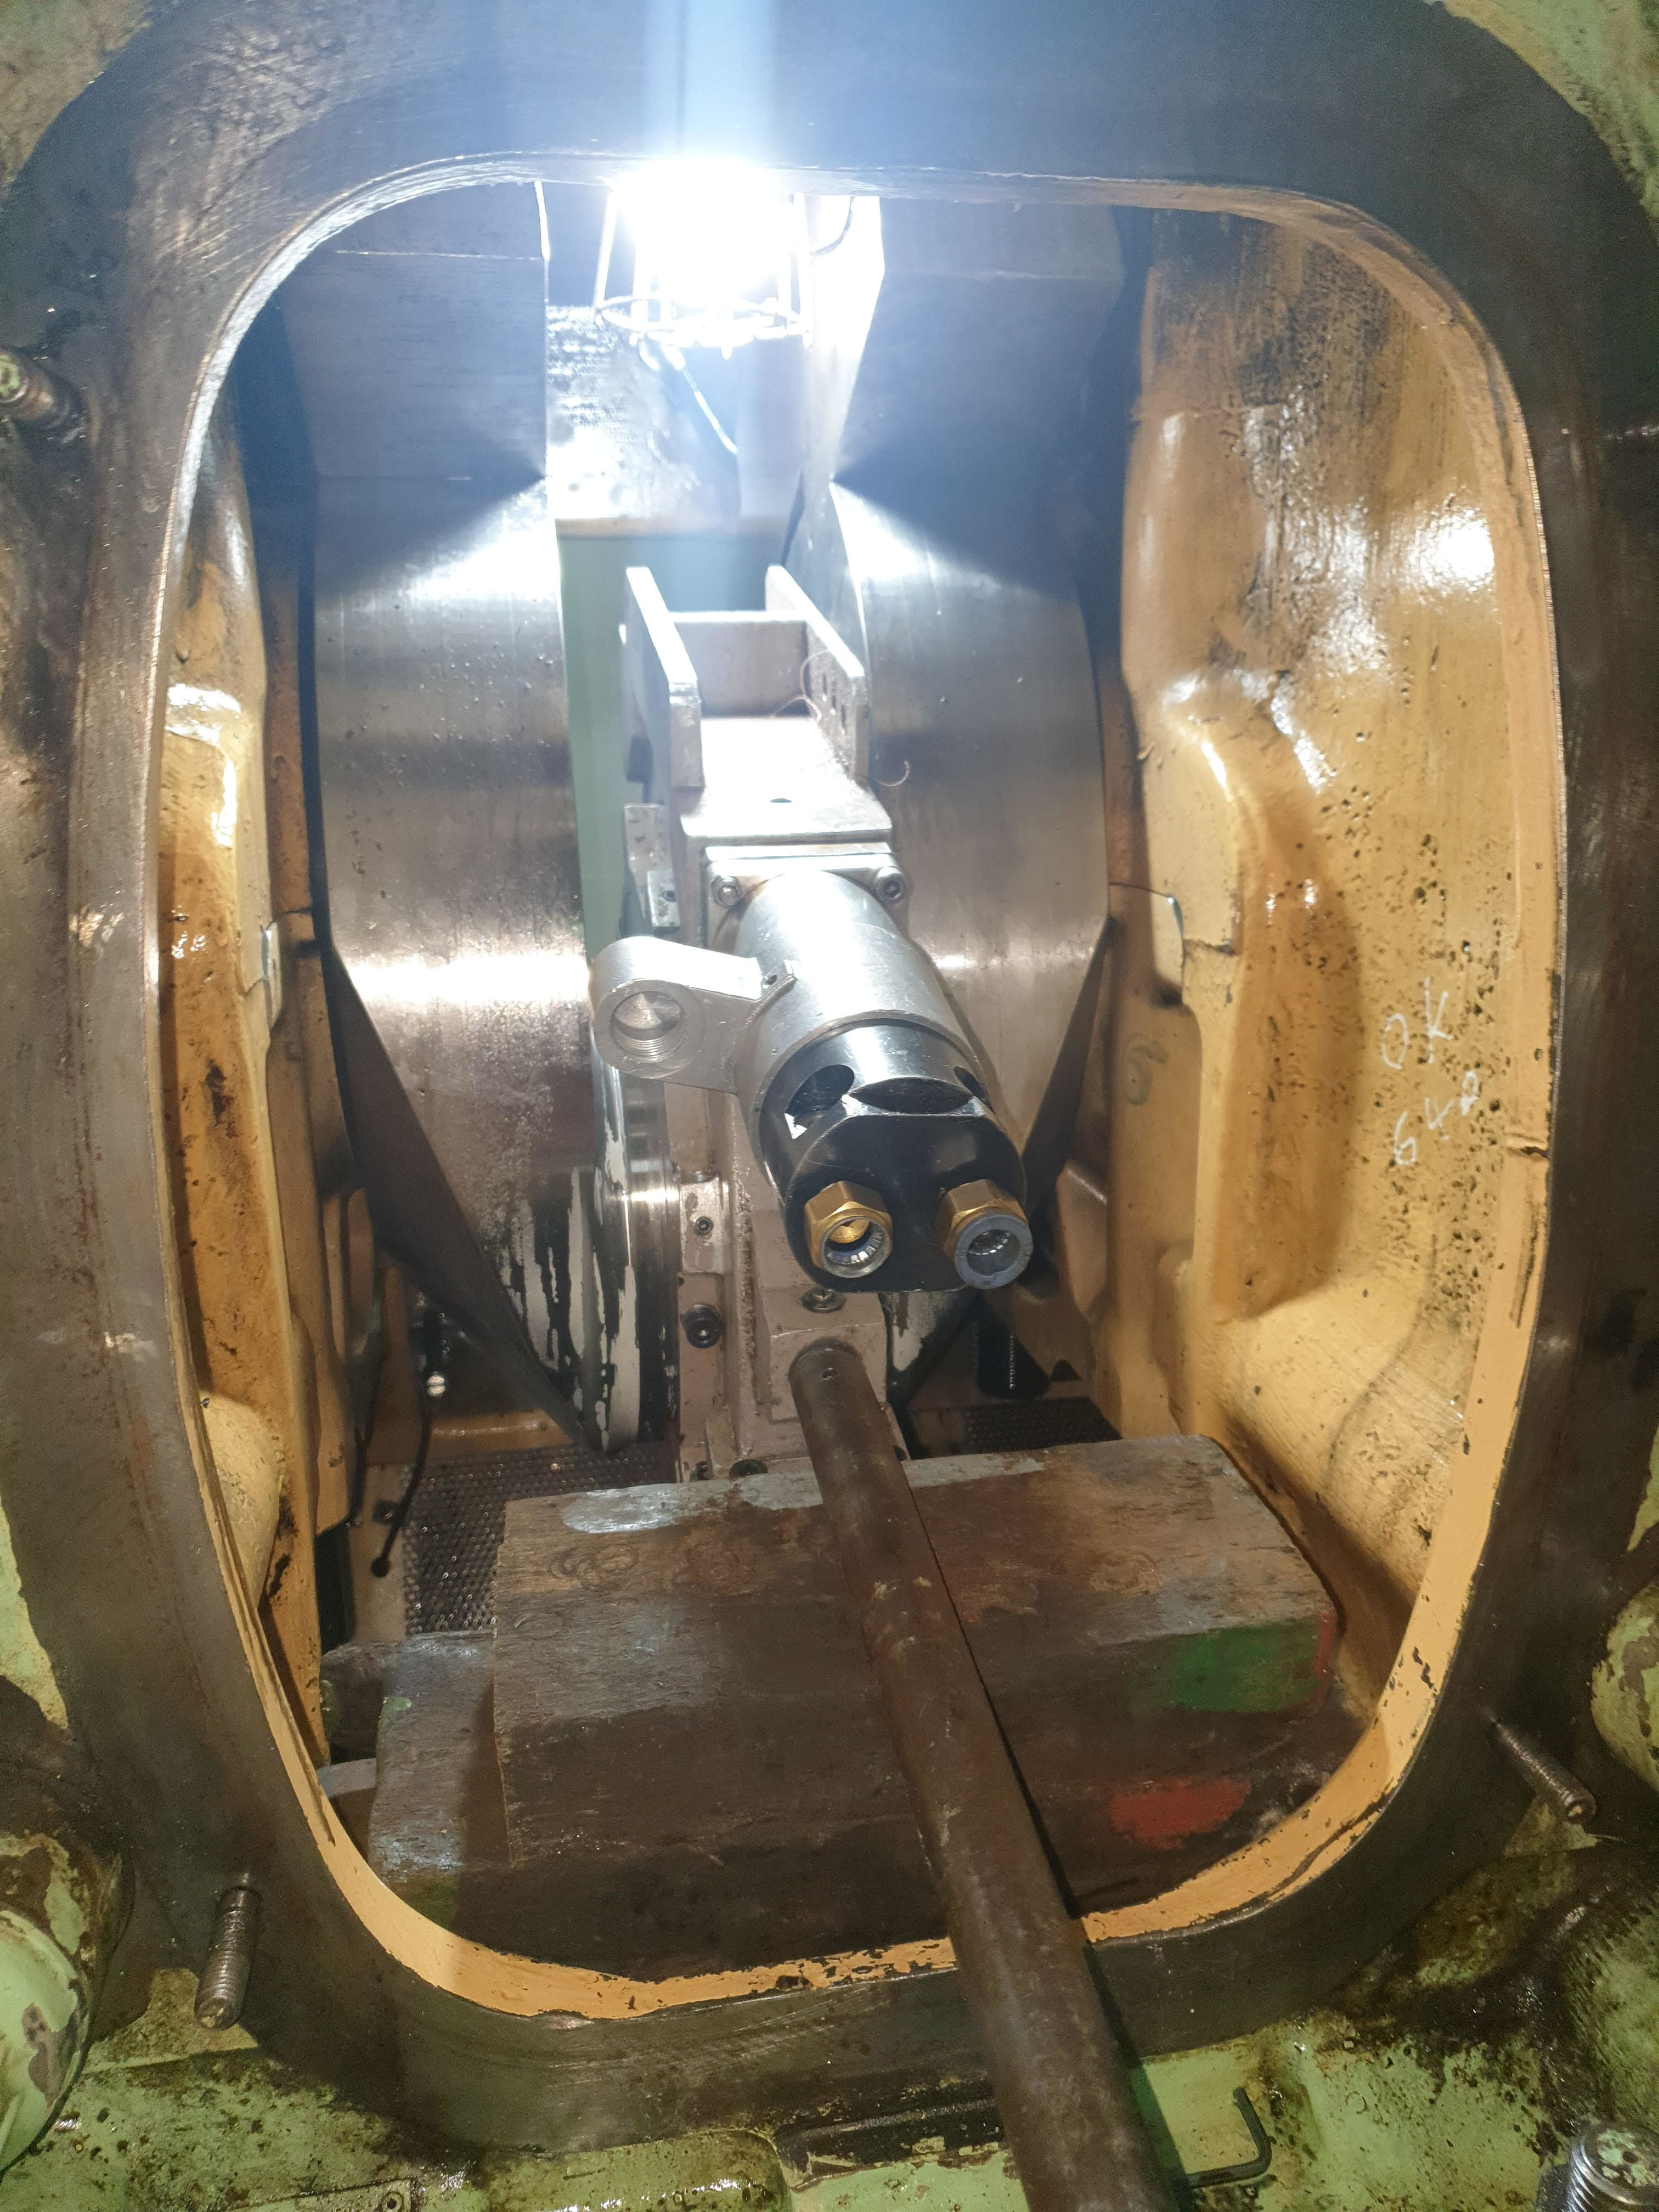 Bergen Rolls Royce Crankshaft repair / Rolls Royce Engine Crankshaft Grinding / RA Power Solutions